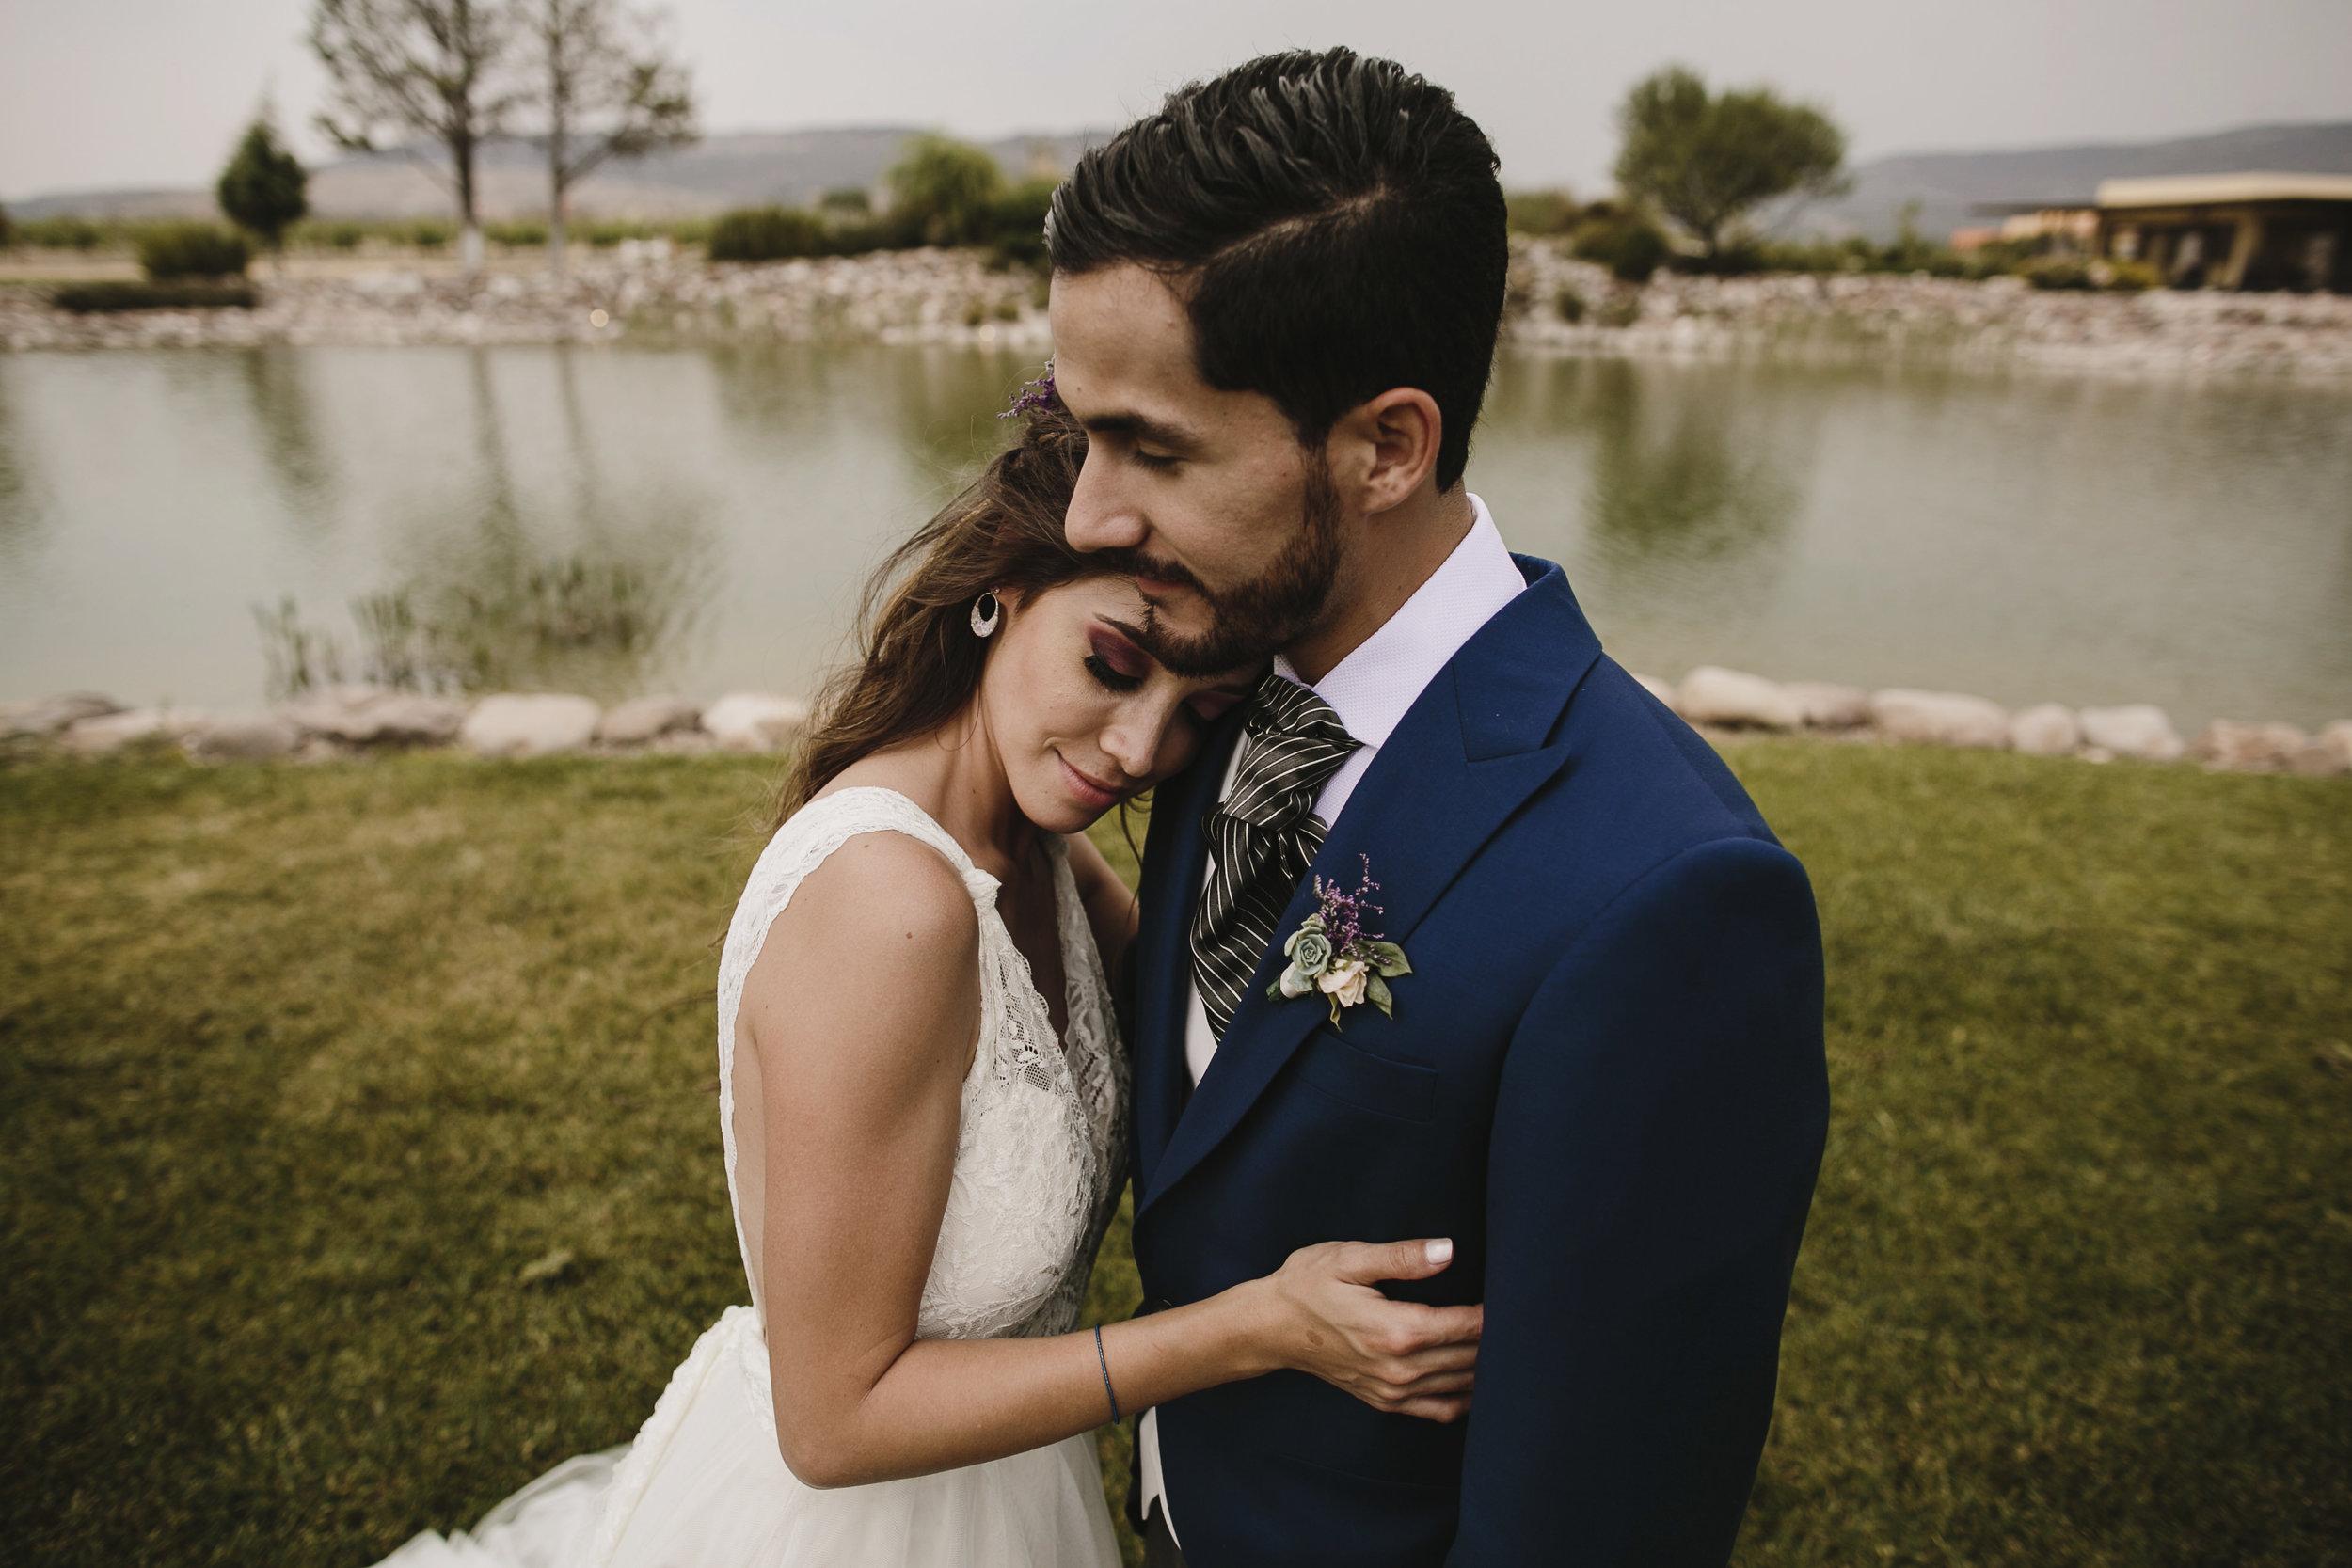 alfons_flores_destination_wedding_photography_mavi_david-1248.JPG